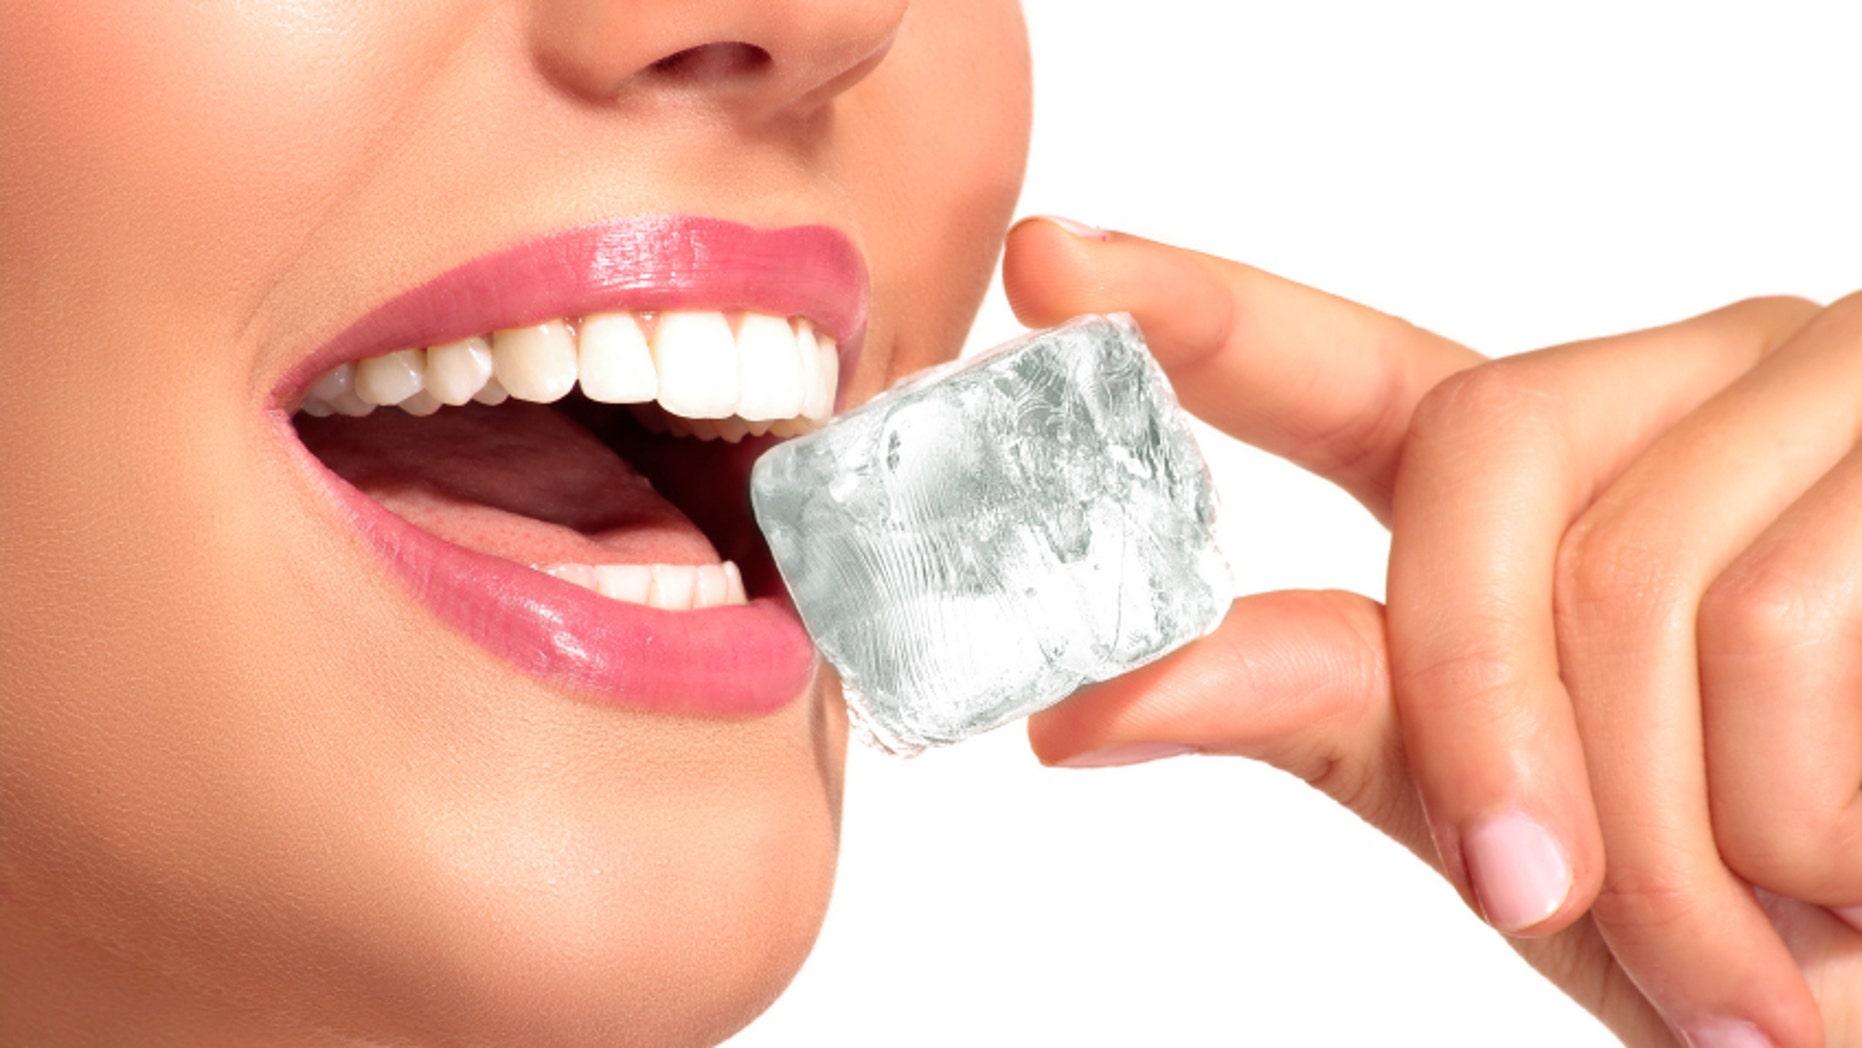 Closeup of beautiful woman biting an ice cube on white